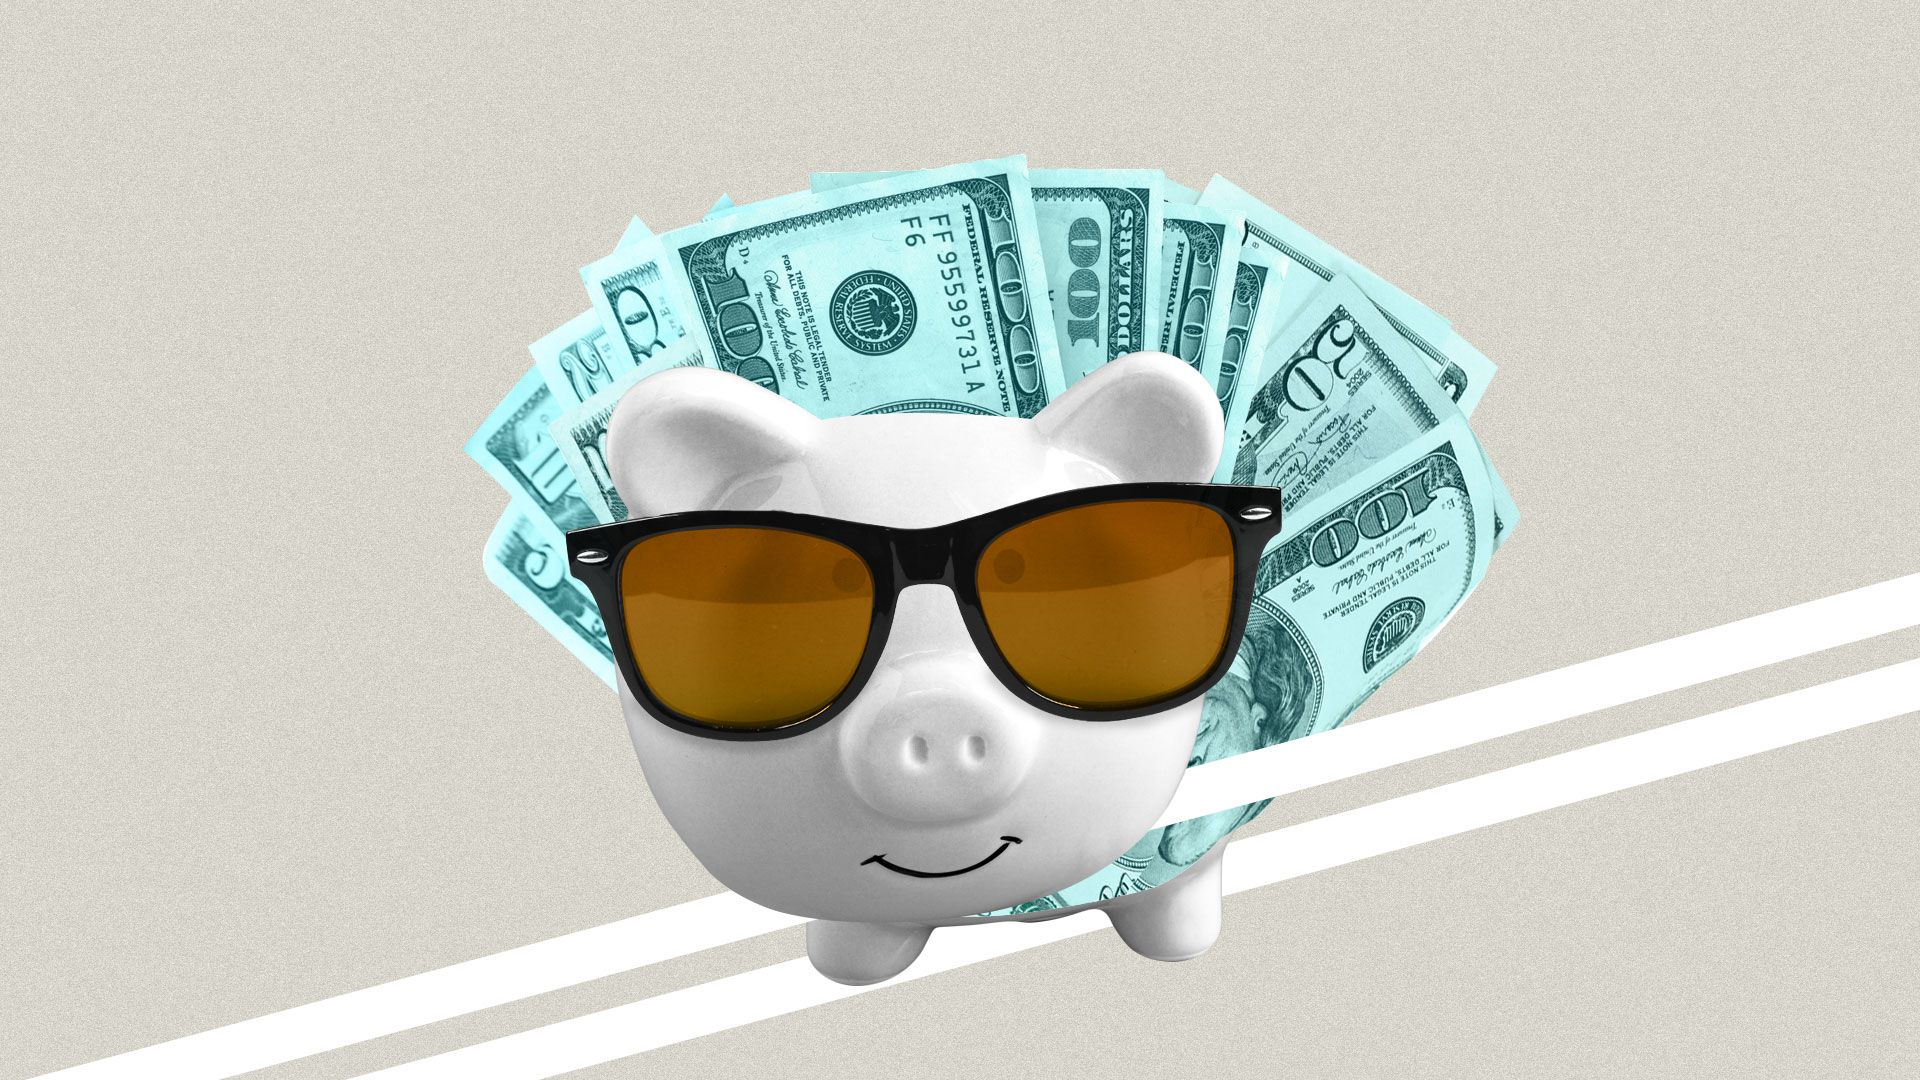 The millennial retirement savers